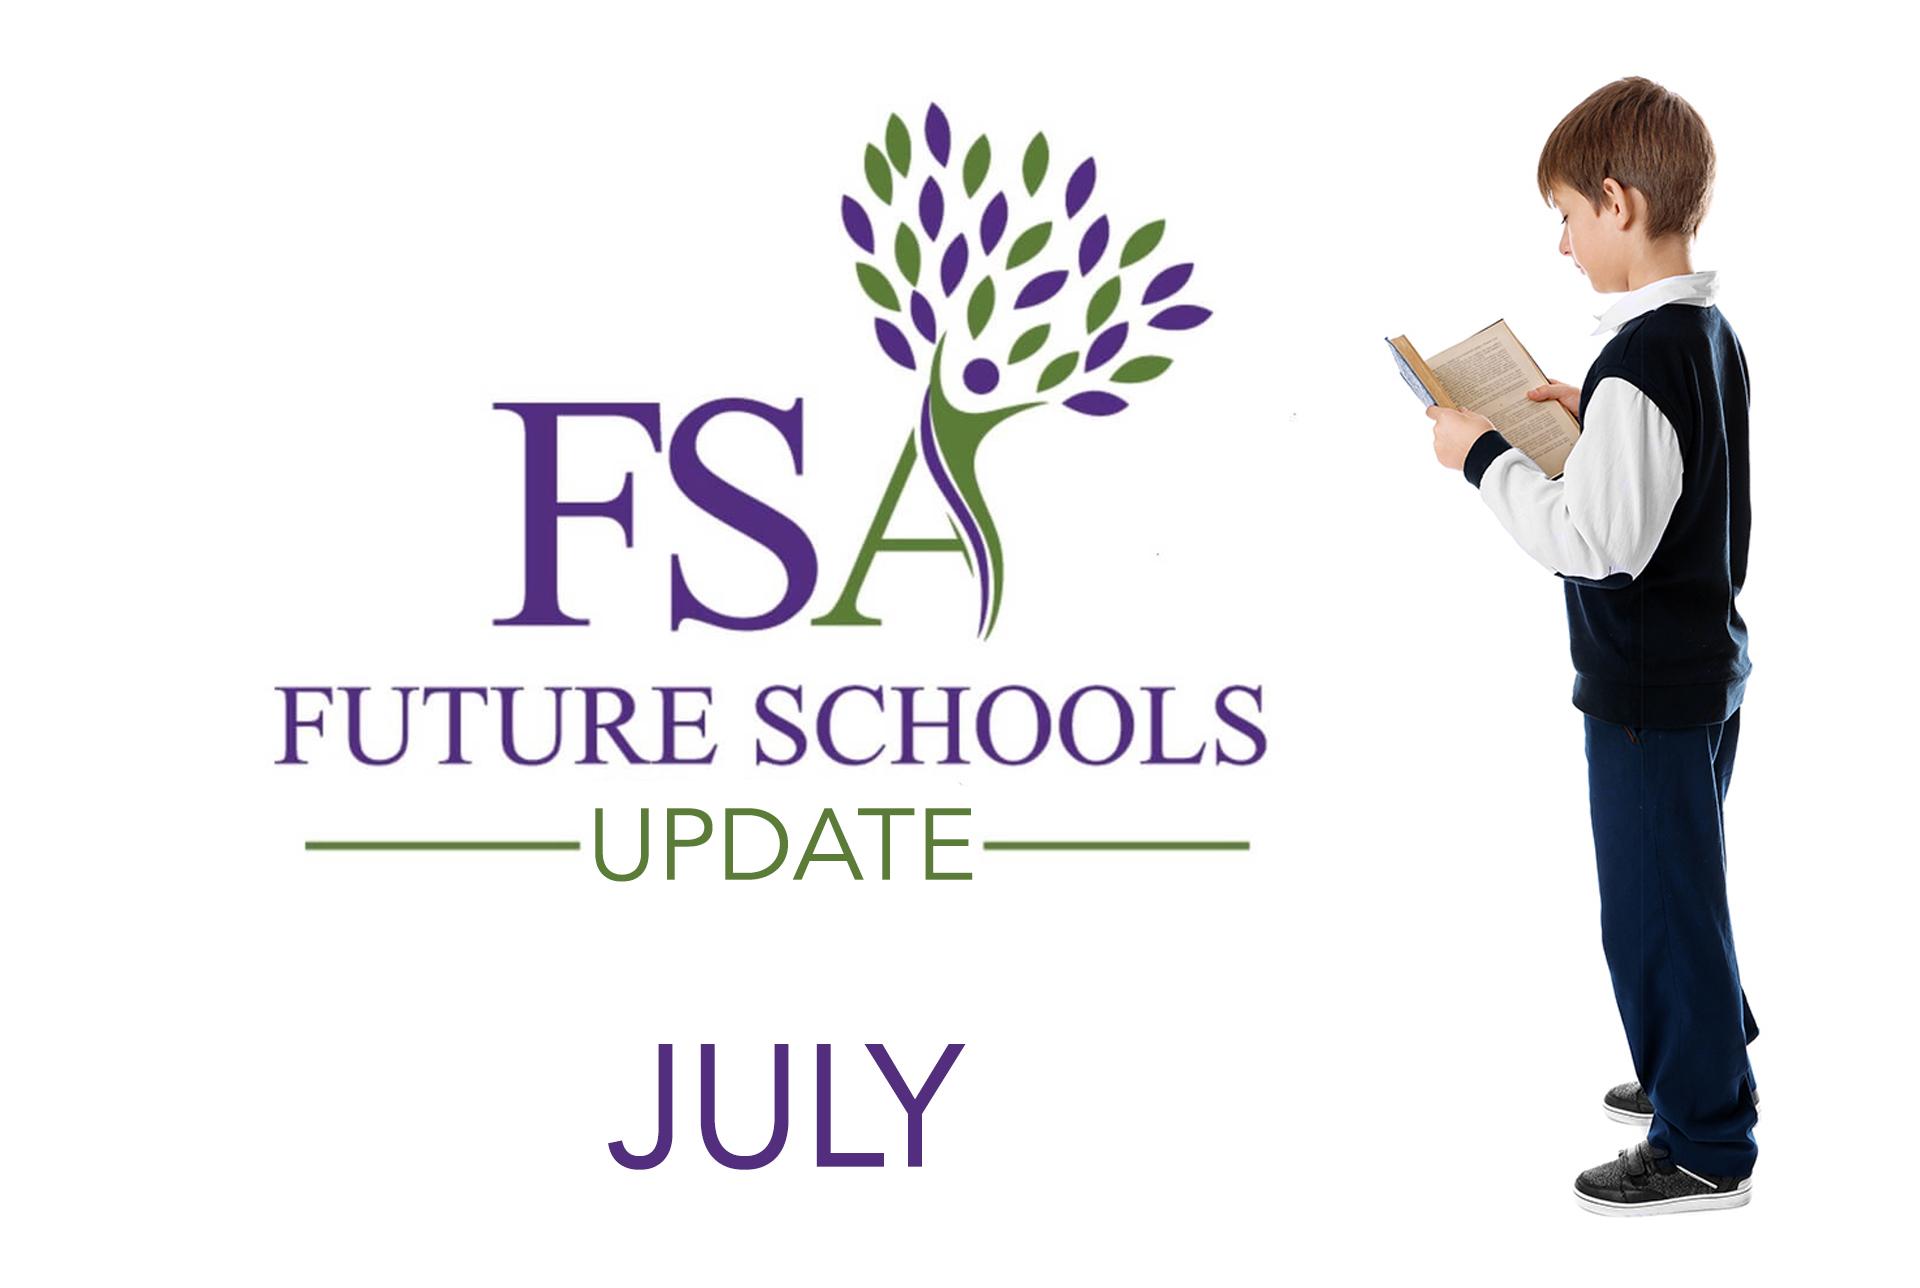 Update July